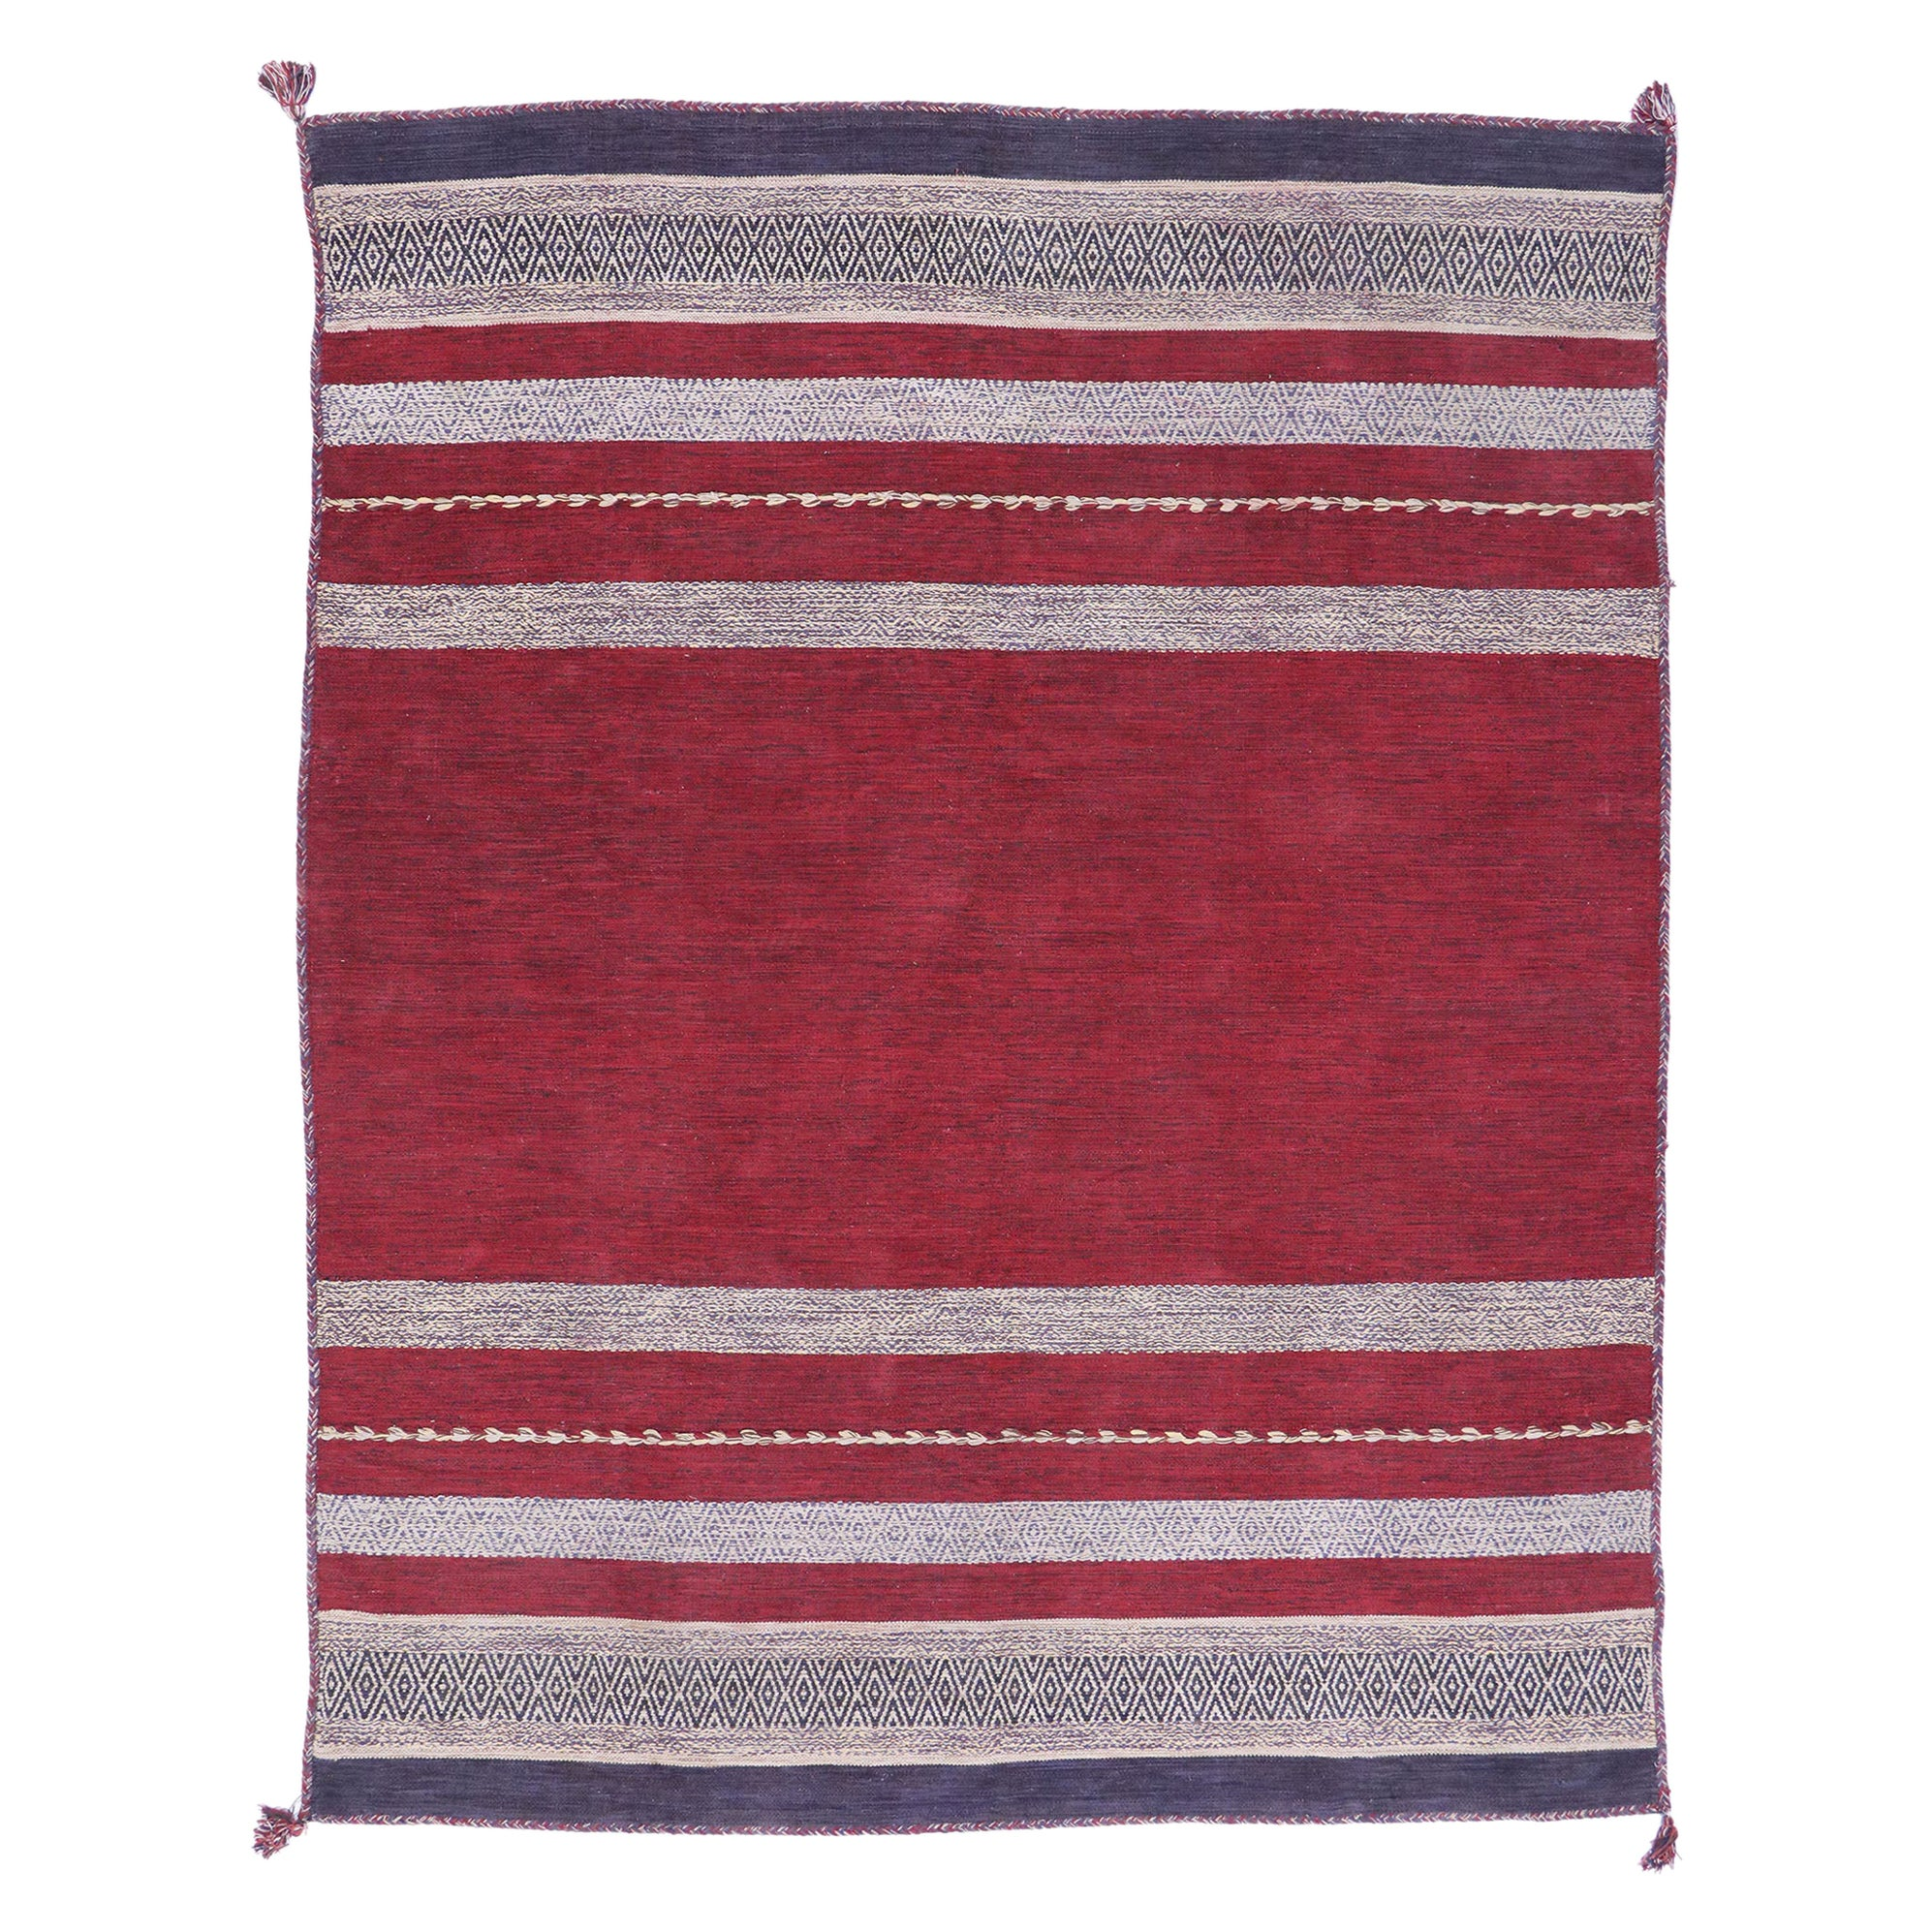 Vintage Berber Moroccan Kilim Rug with Nautical Style